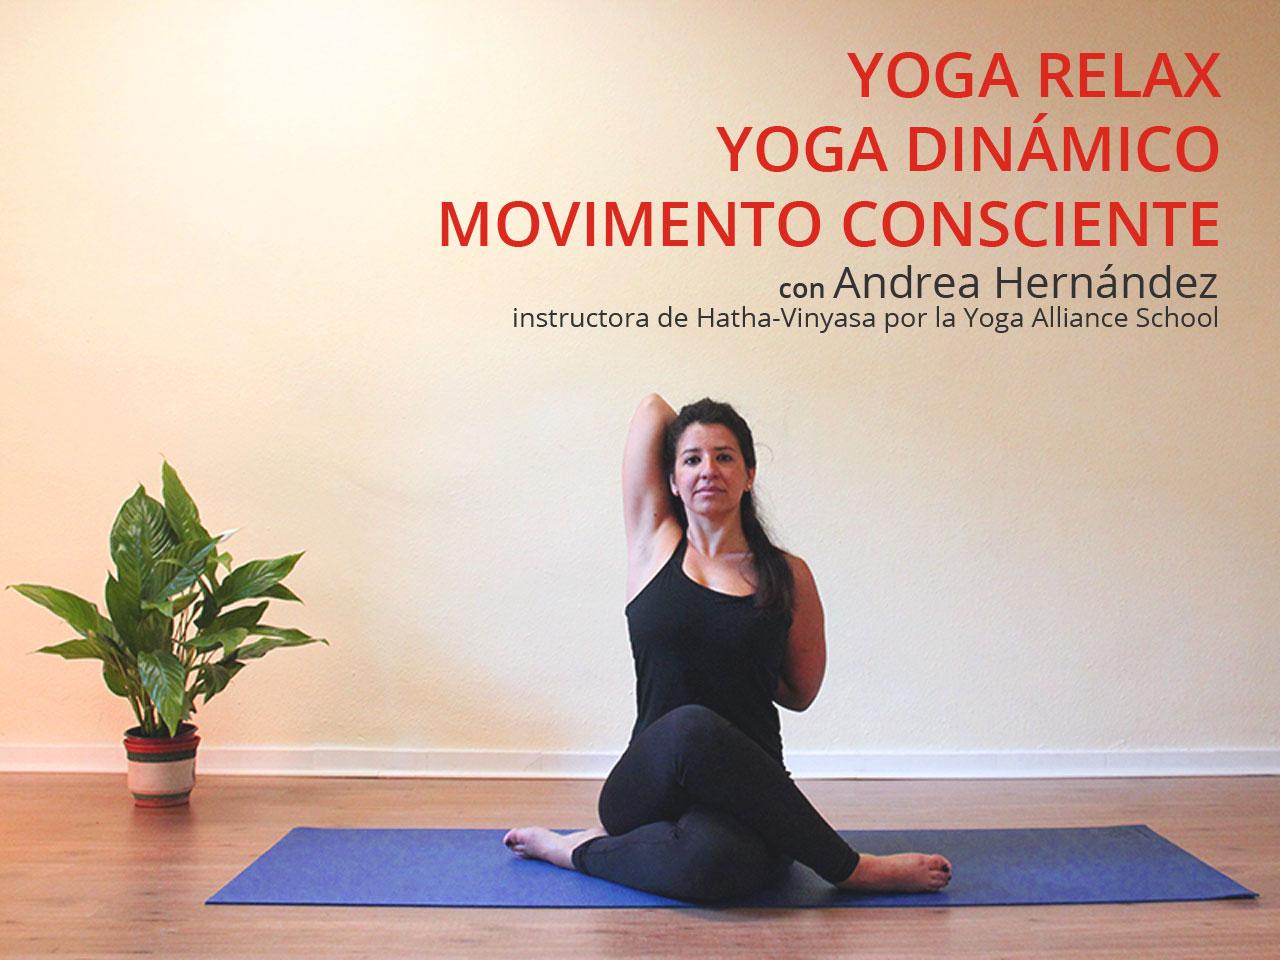 Curso de yoga con Andrea Hernández